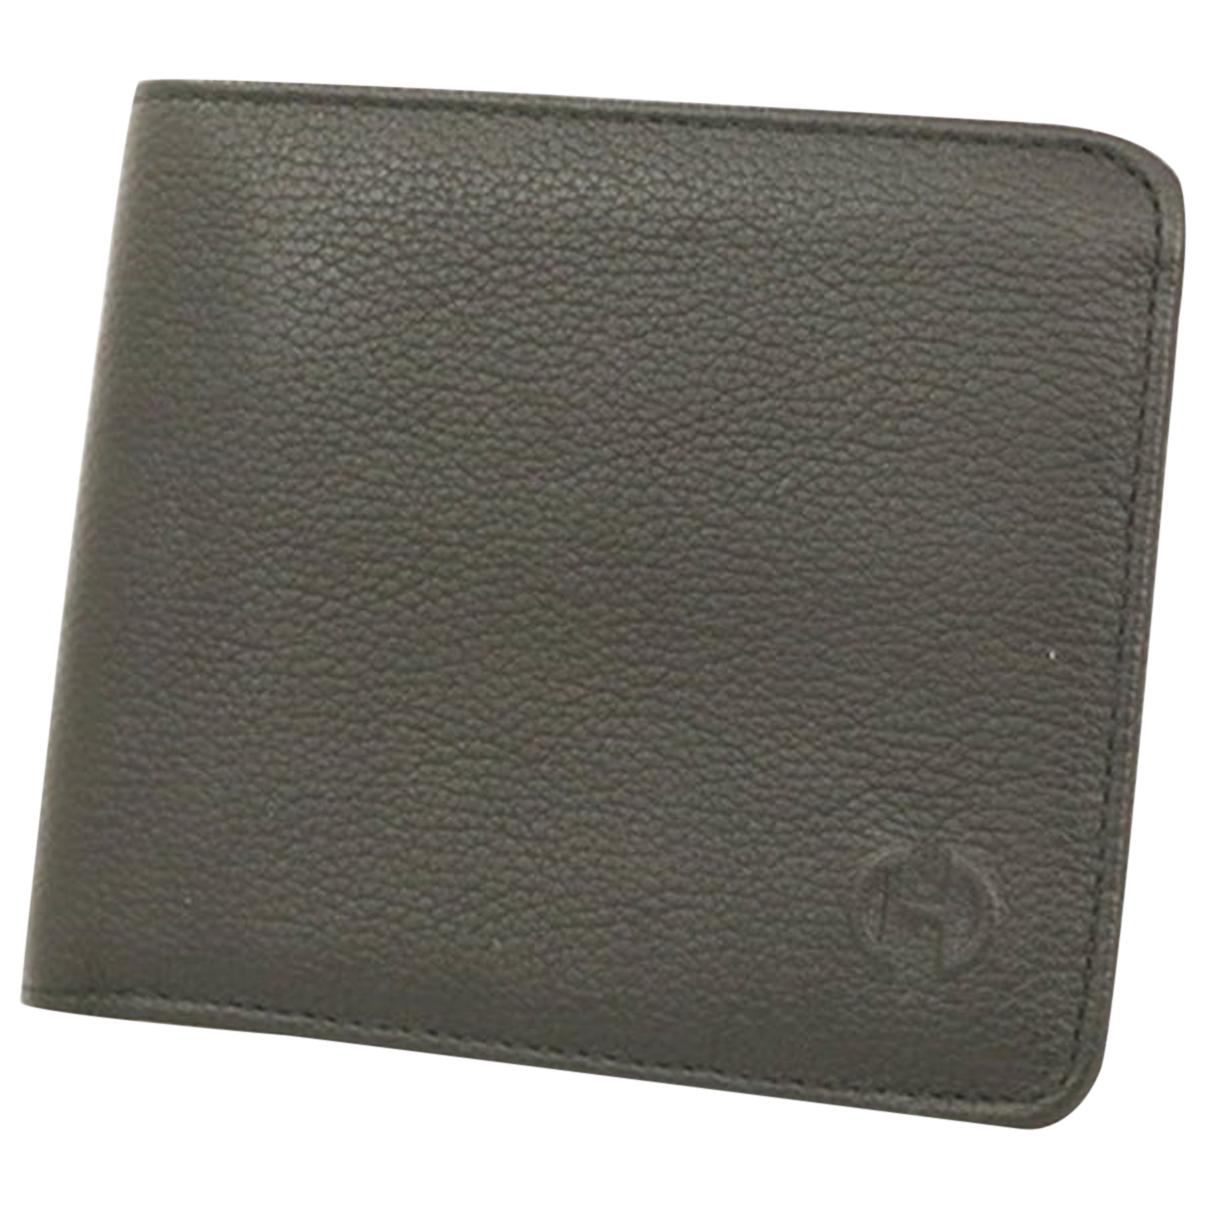 Celine N Black Leather wallet for Women N